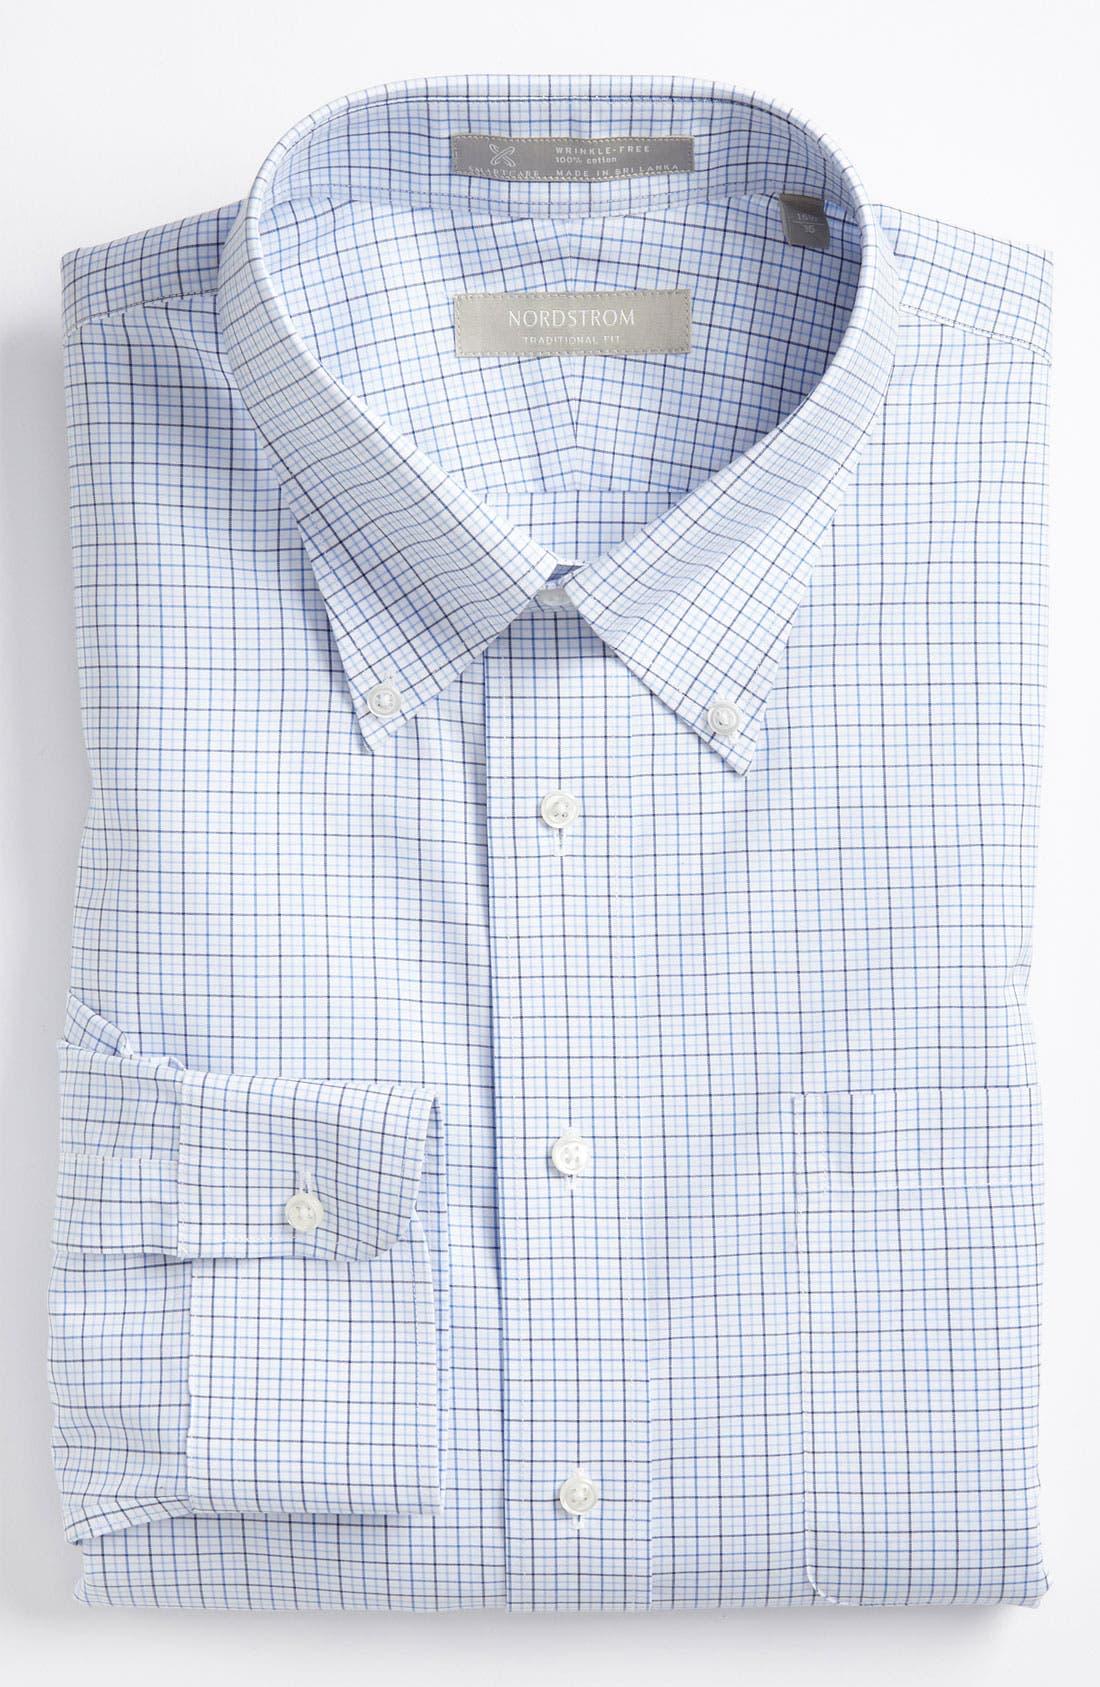 Alternate Image 1 Selected - Nordstrom Smartcare™ Traditional Fit Dress Shirt